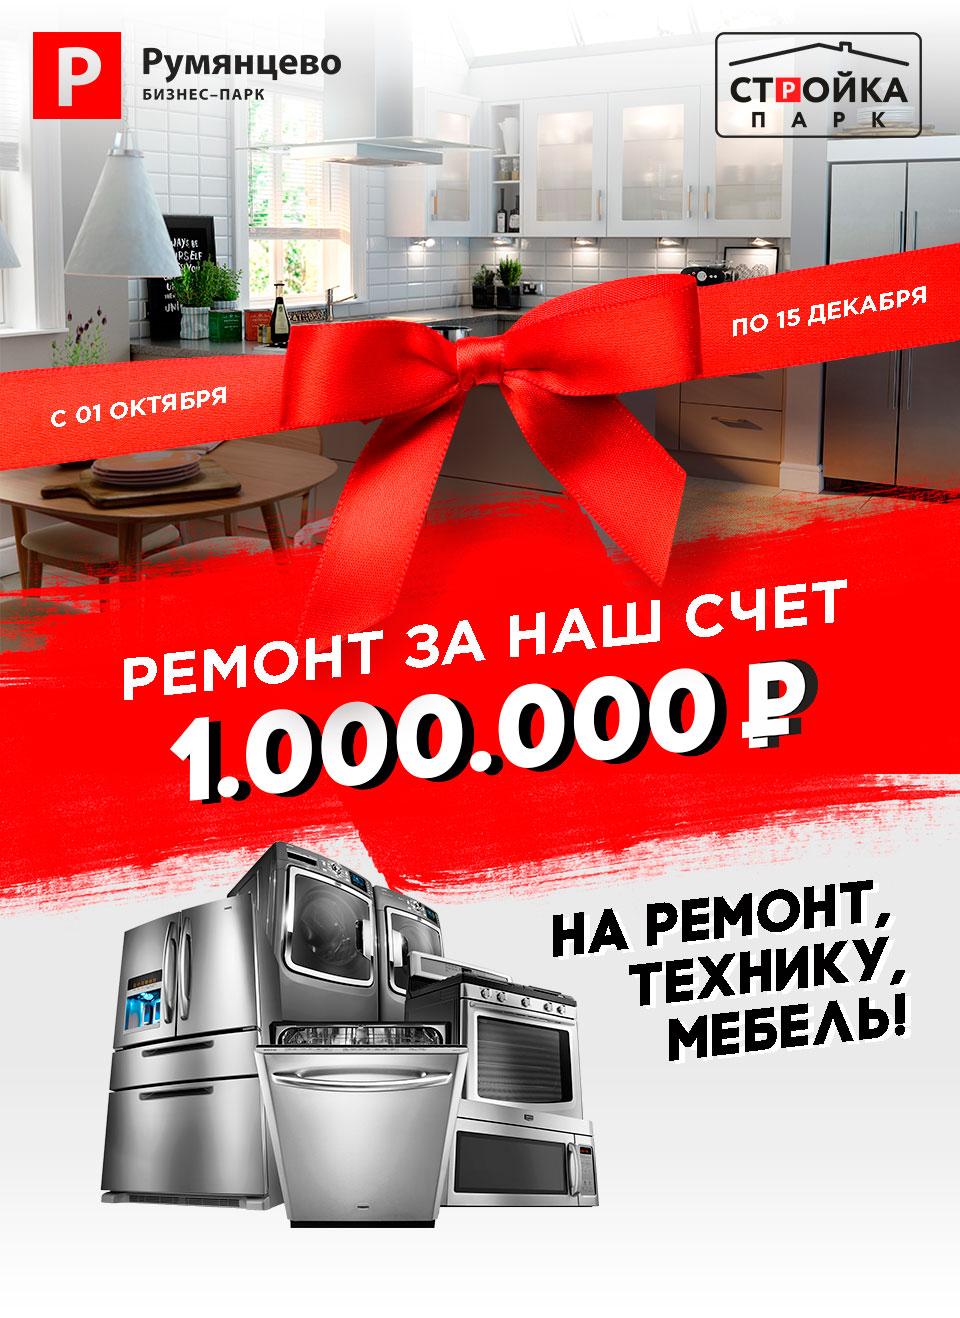 Ремонт за наш счет 1000000р, на ремонт, технику, мебель!